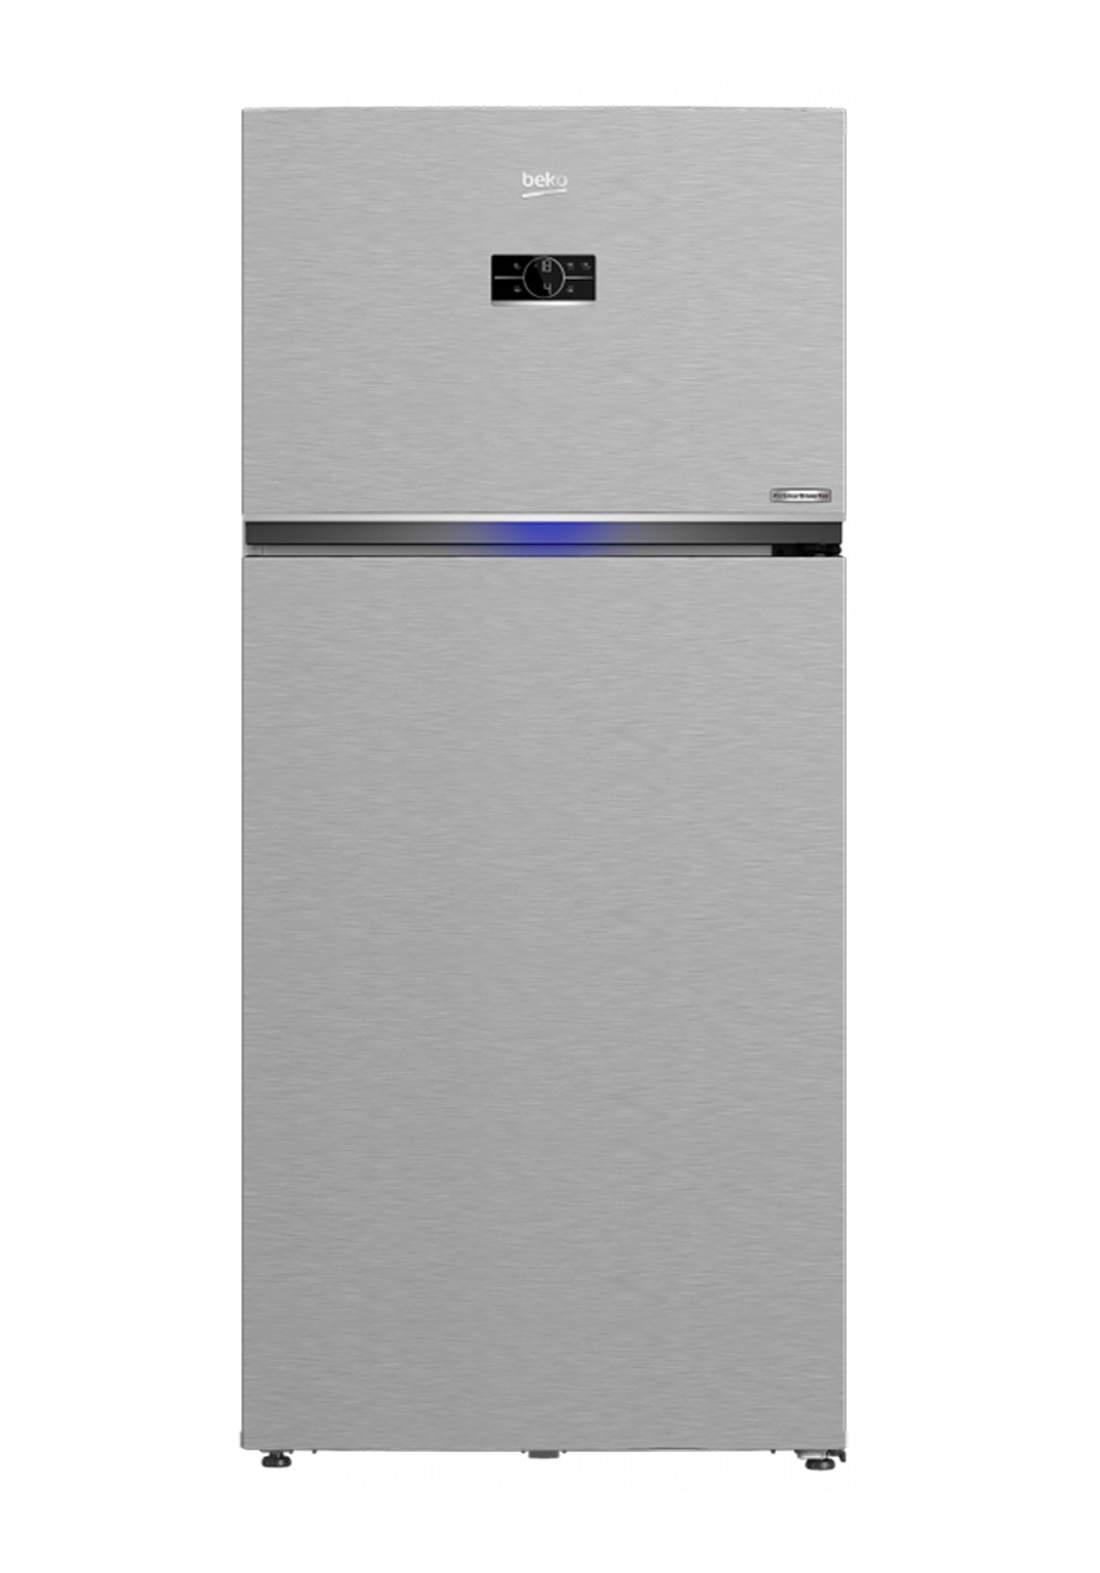 Beko RDNE 700E40 XP  Refrigerator 650 Liter - Gray